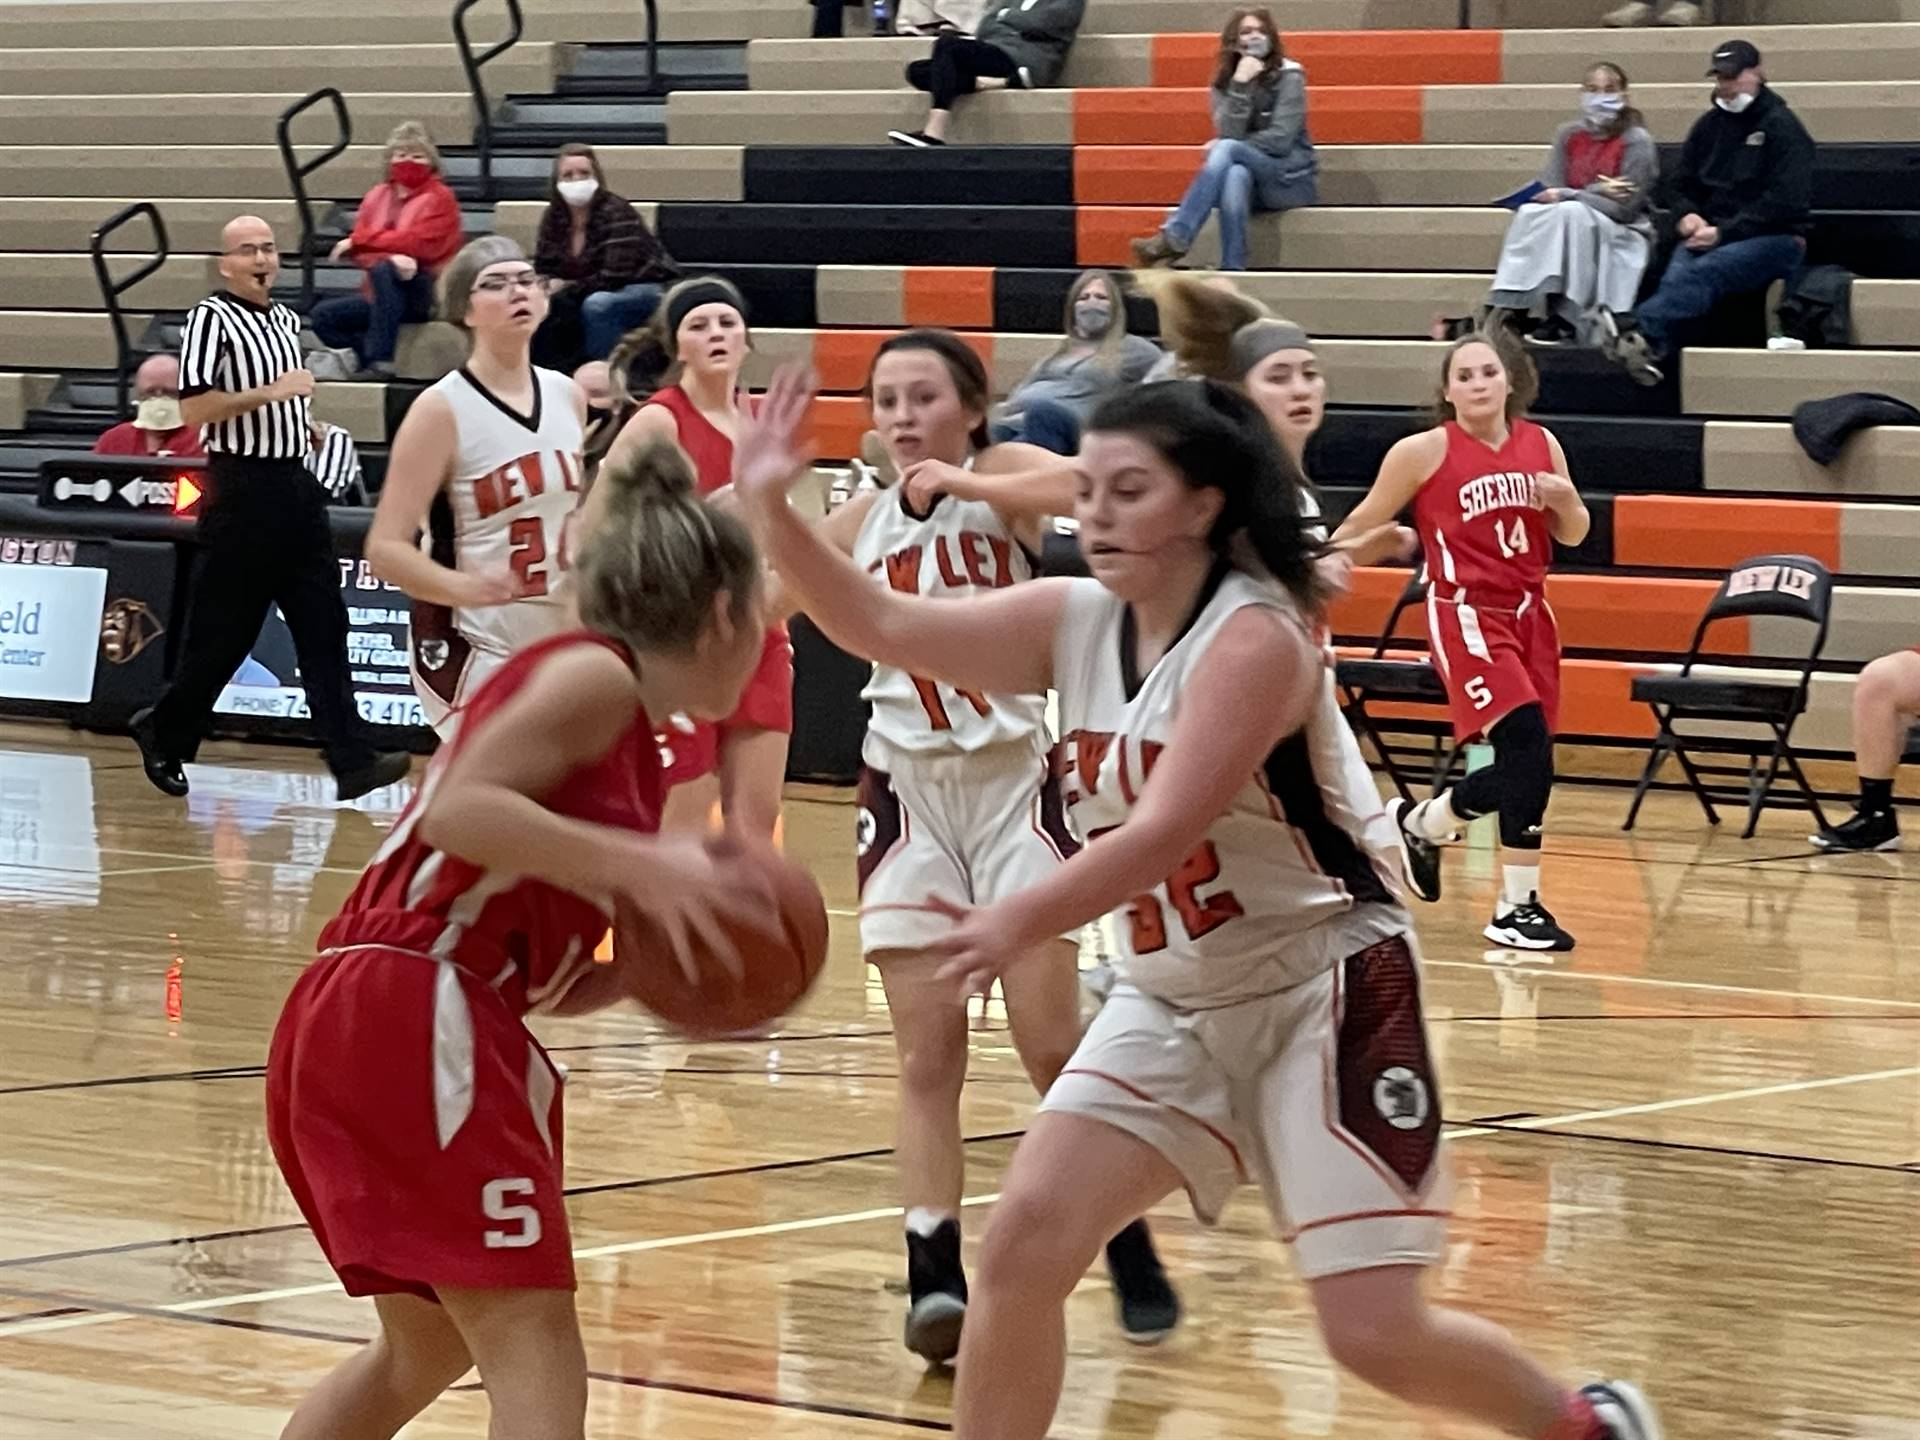 Varsity Girls Basketball taking on Sheridan